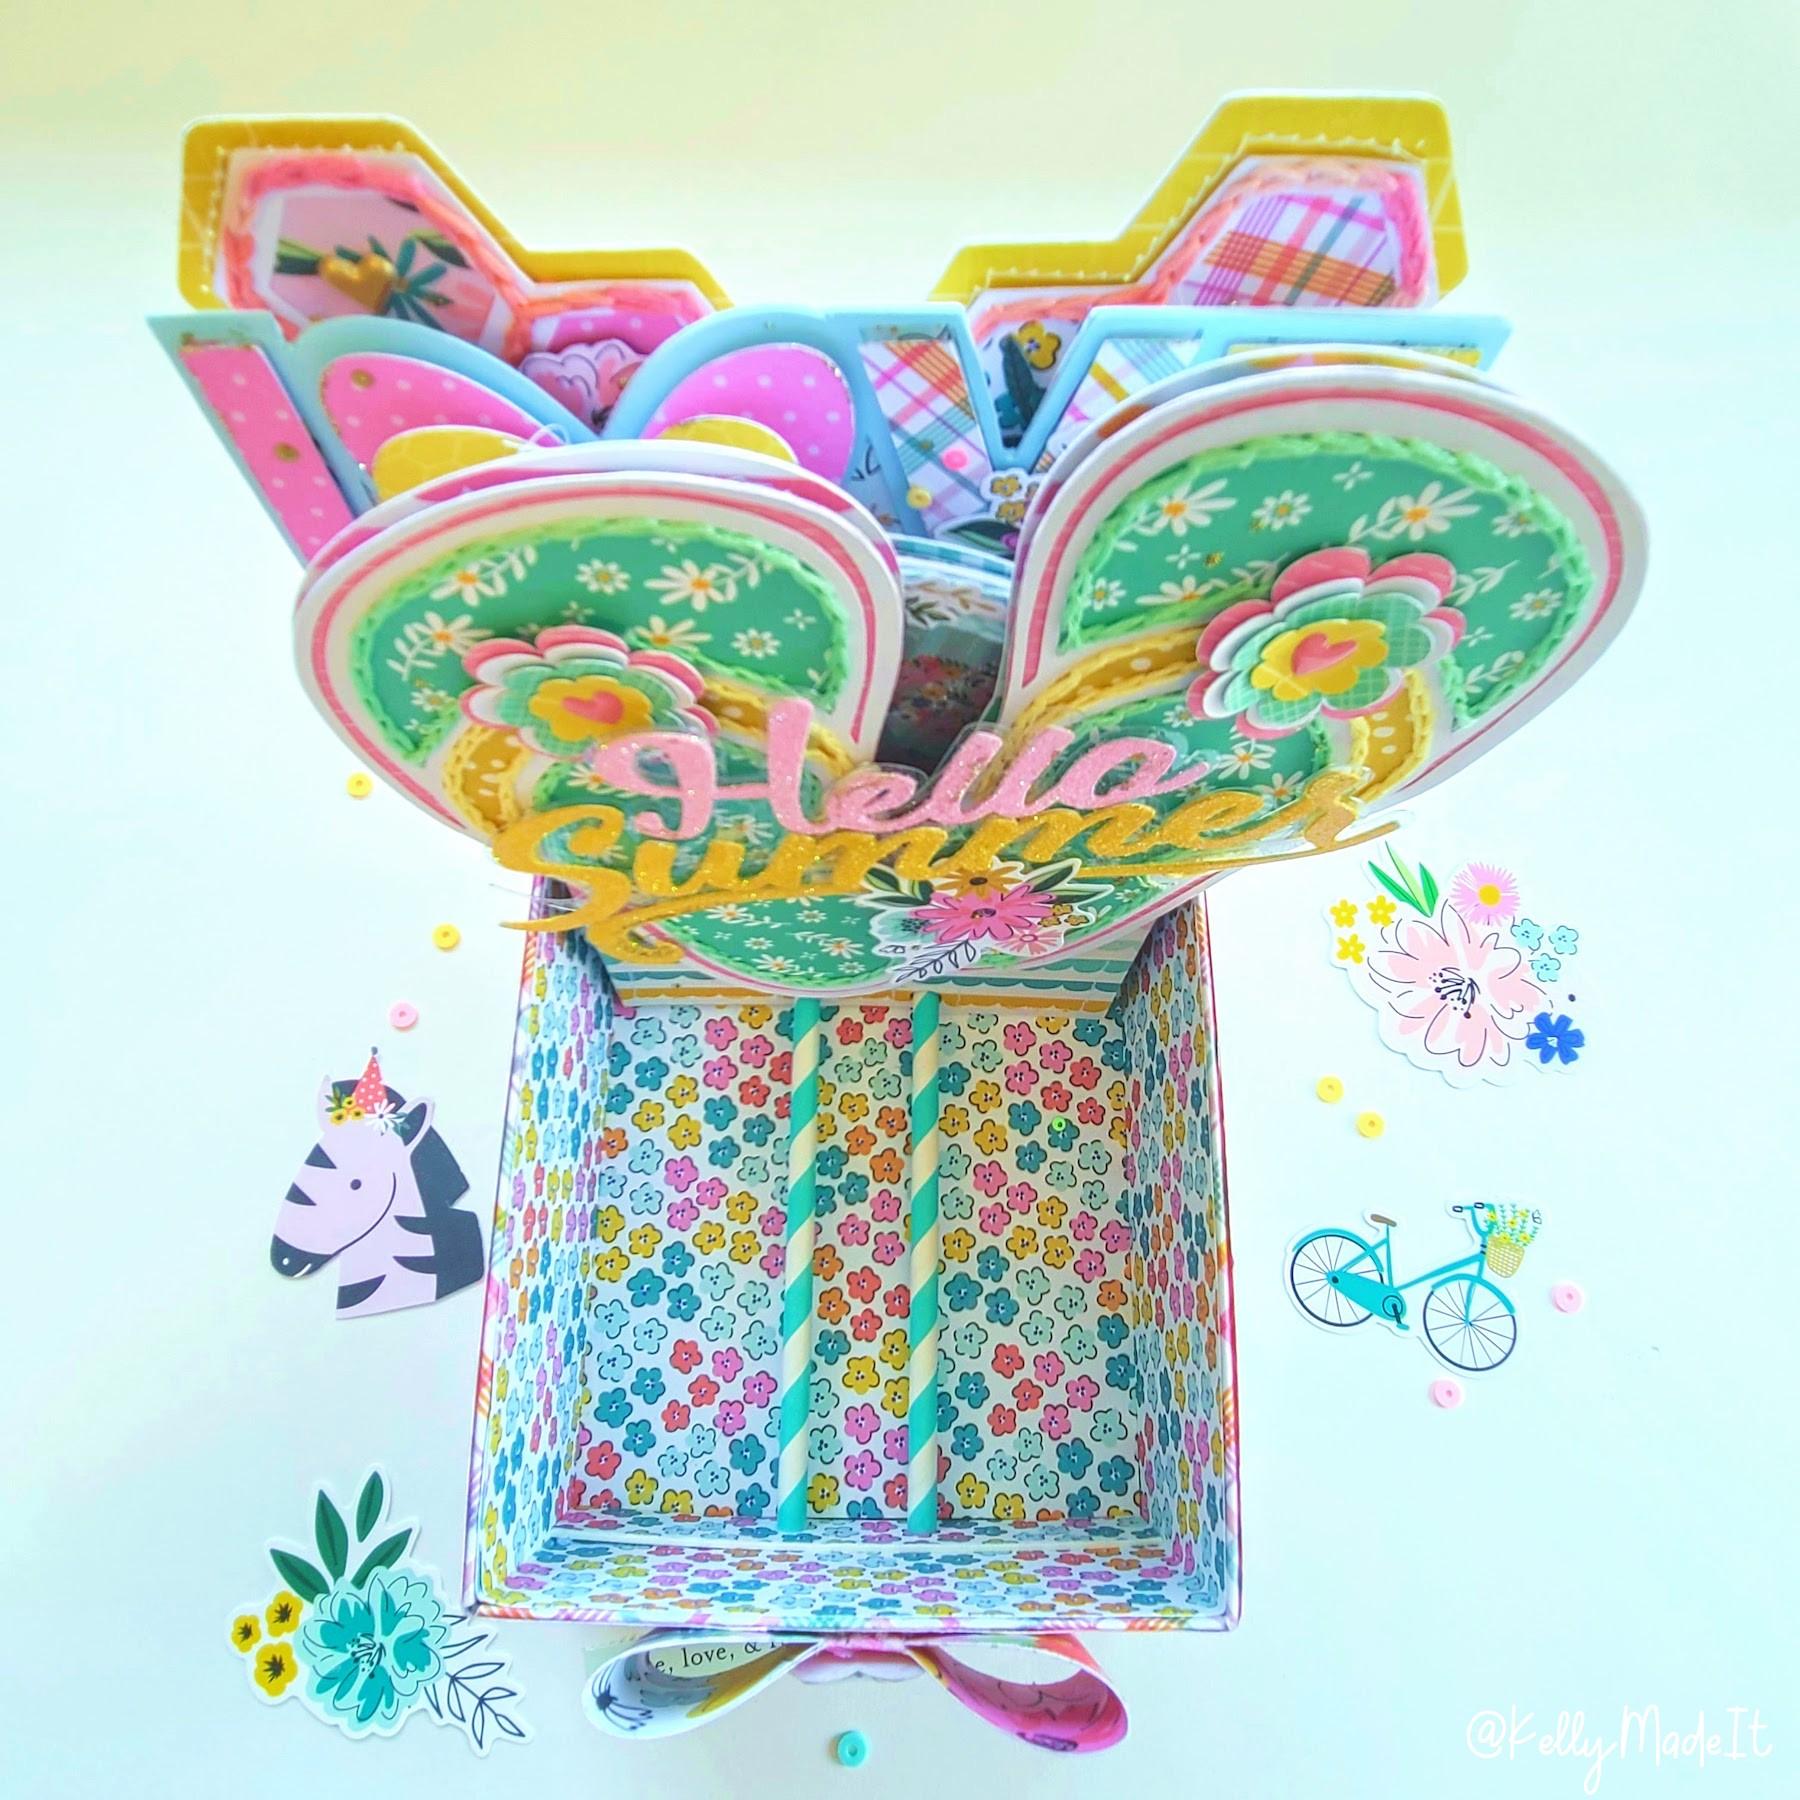 KMI-Memorybox Card 4 Hello Summer 2